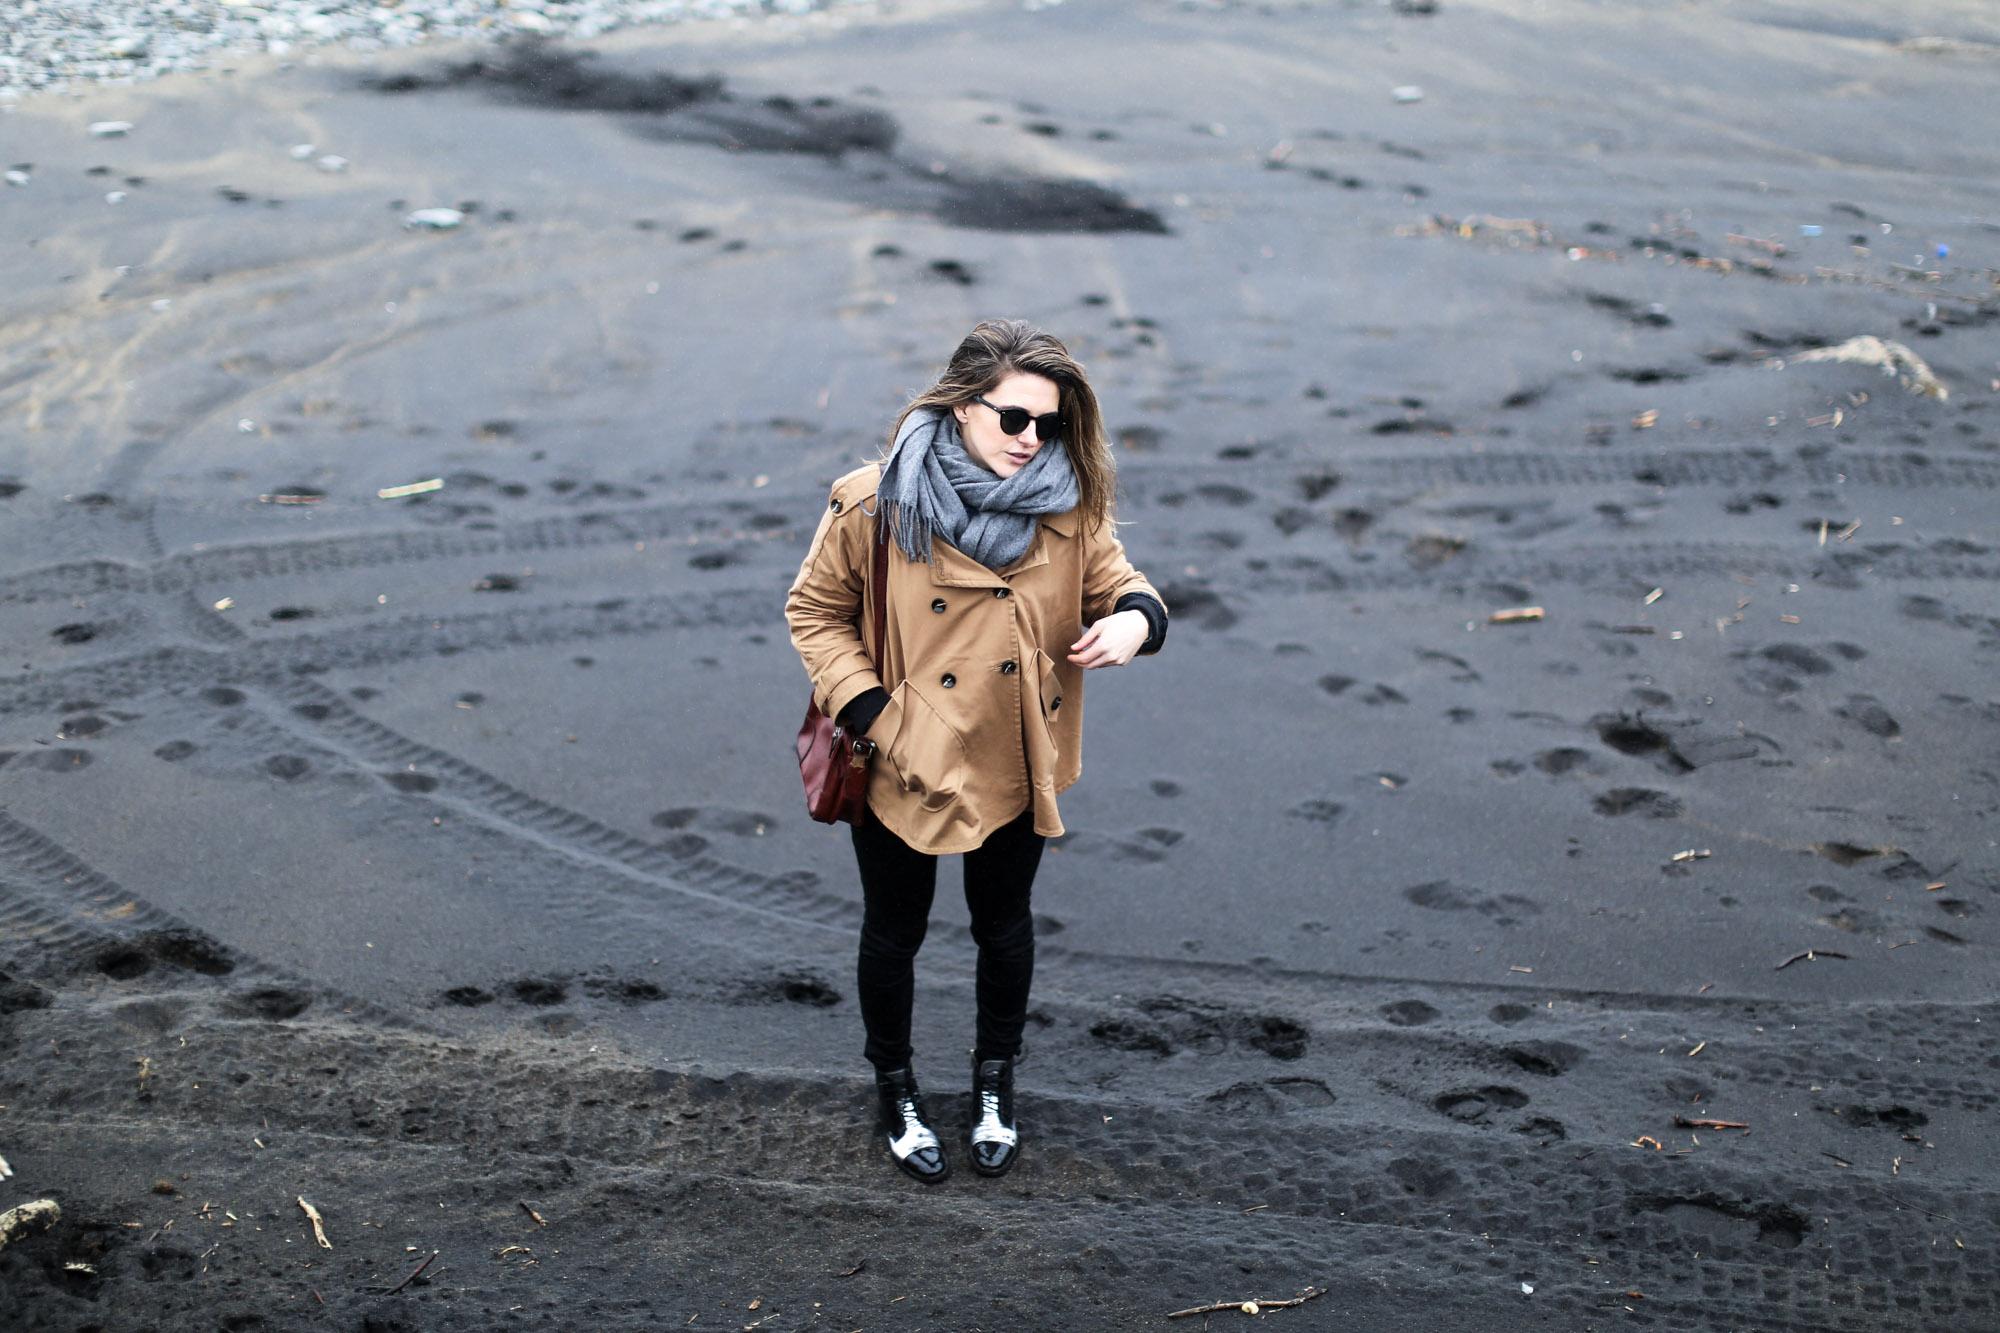 Clochet-streetstyle-azkorri-playa-pertini-boots-h&m-trend-trench-cape-6